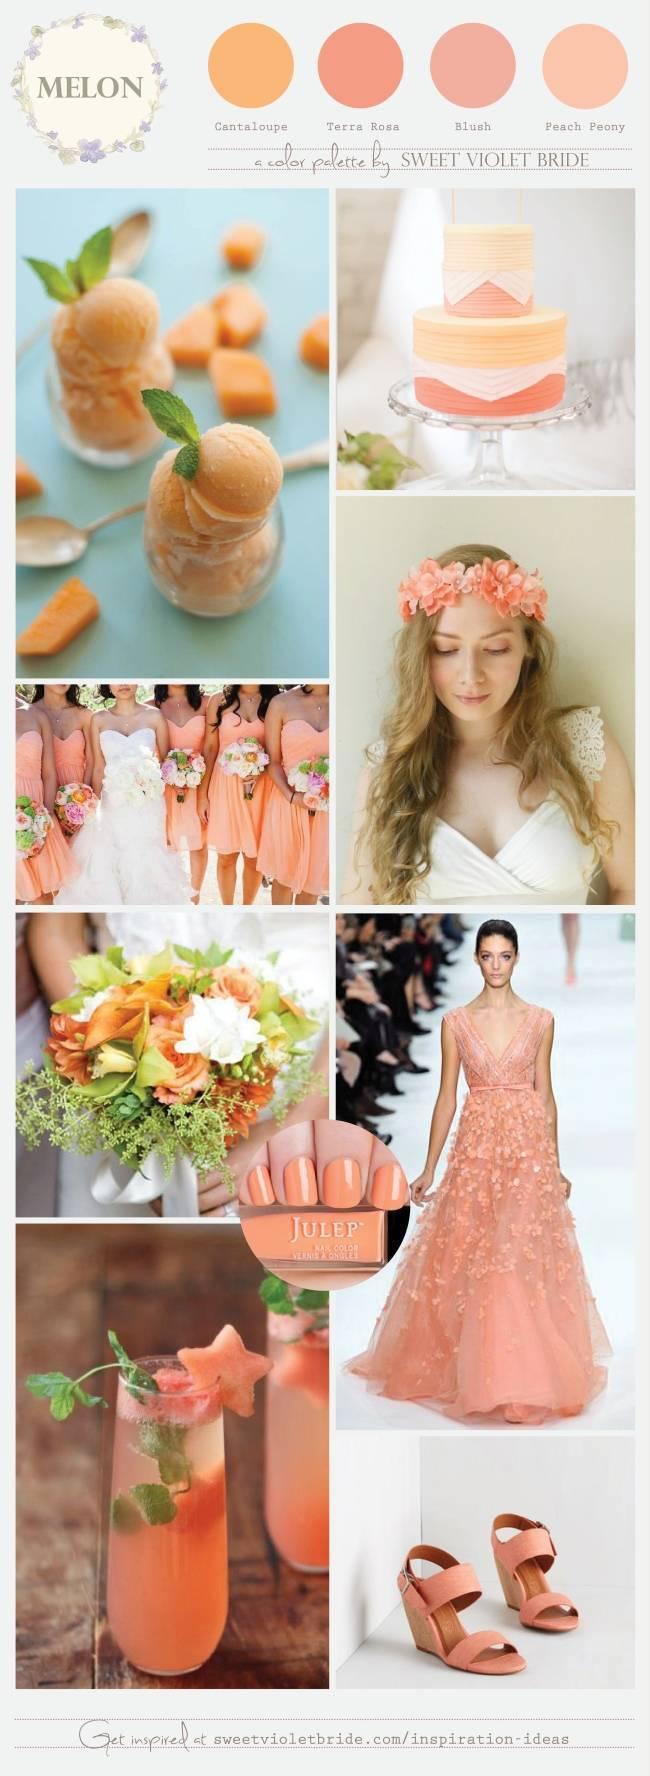 Melon Wedding Palette